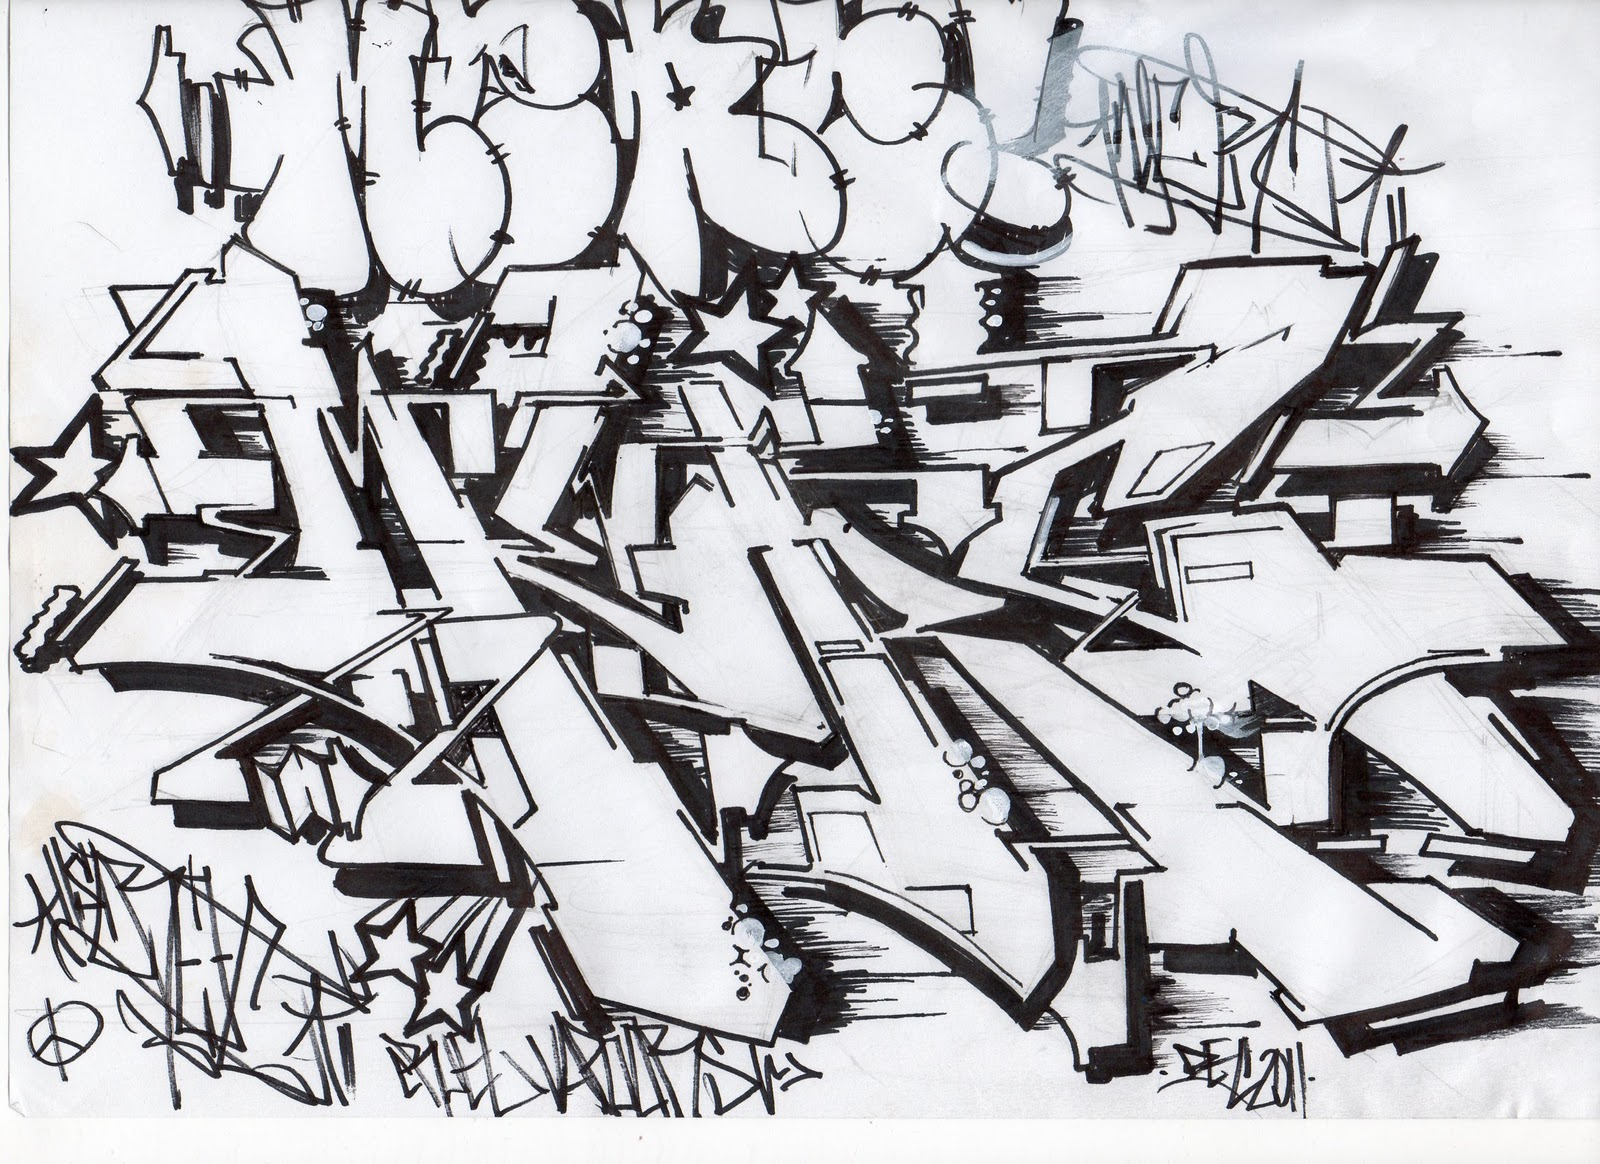 skroez cvk - Cardiff based graffiti artist